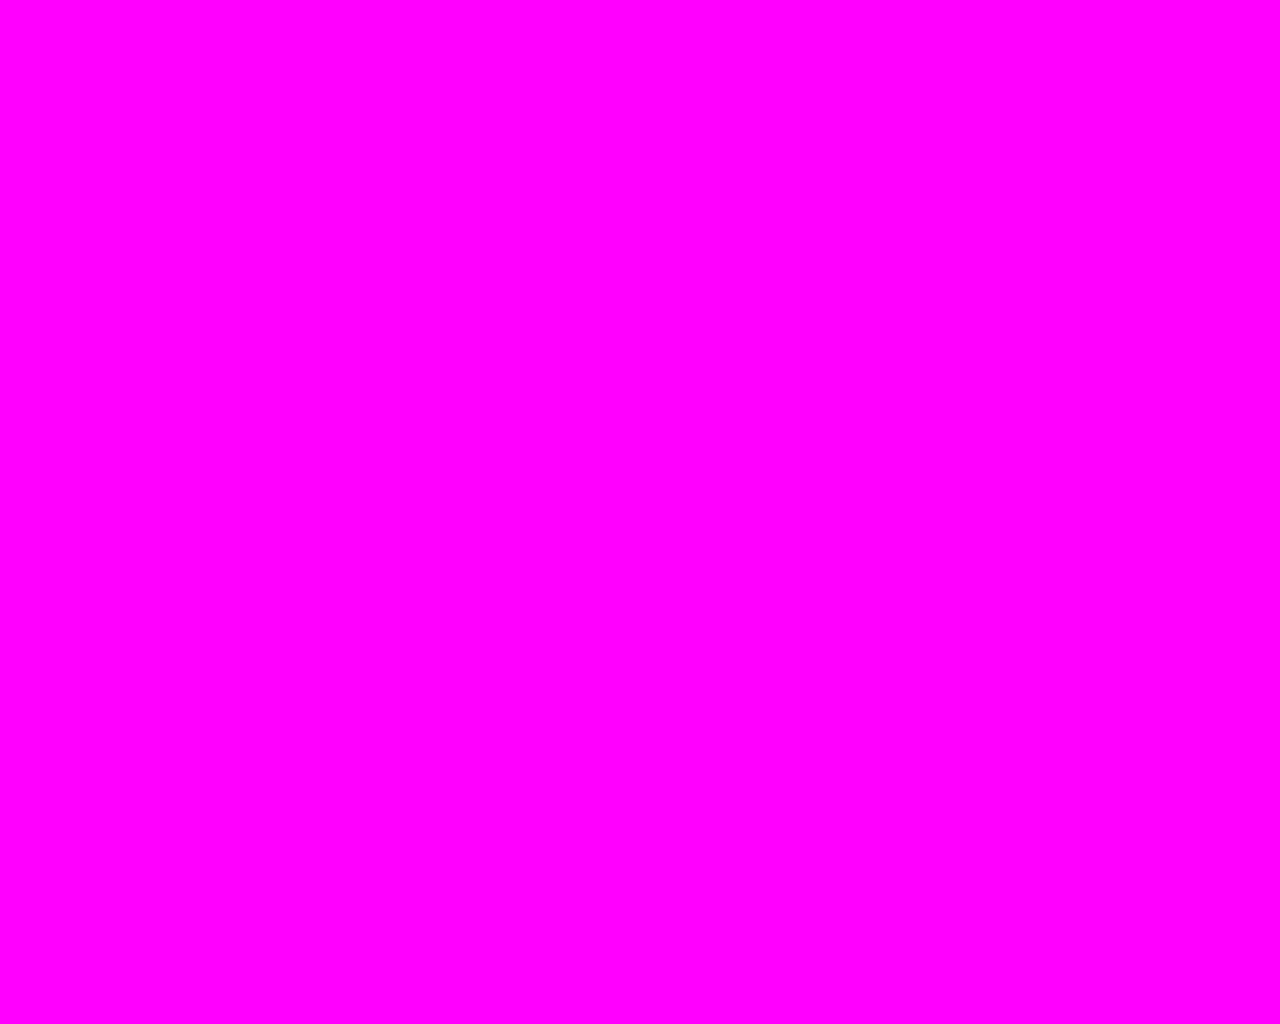 1280x1024 Fuchsia Solid Color Background